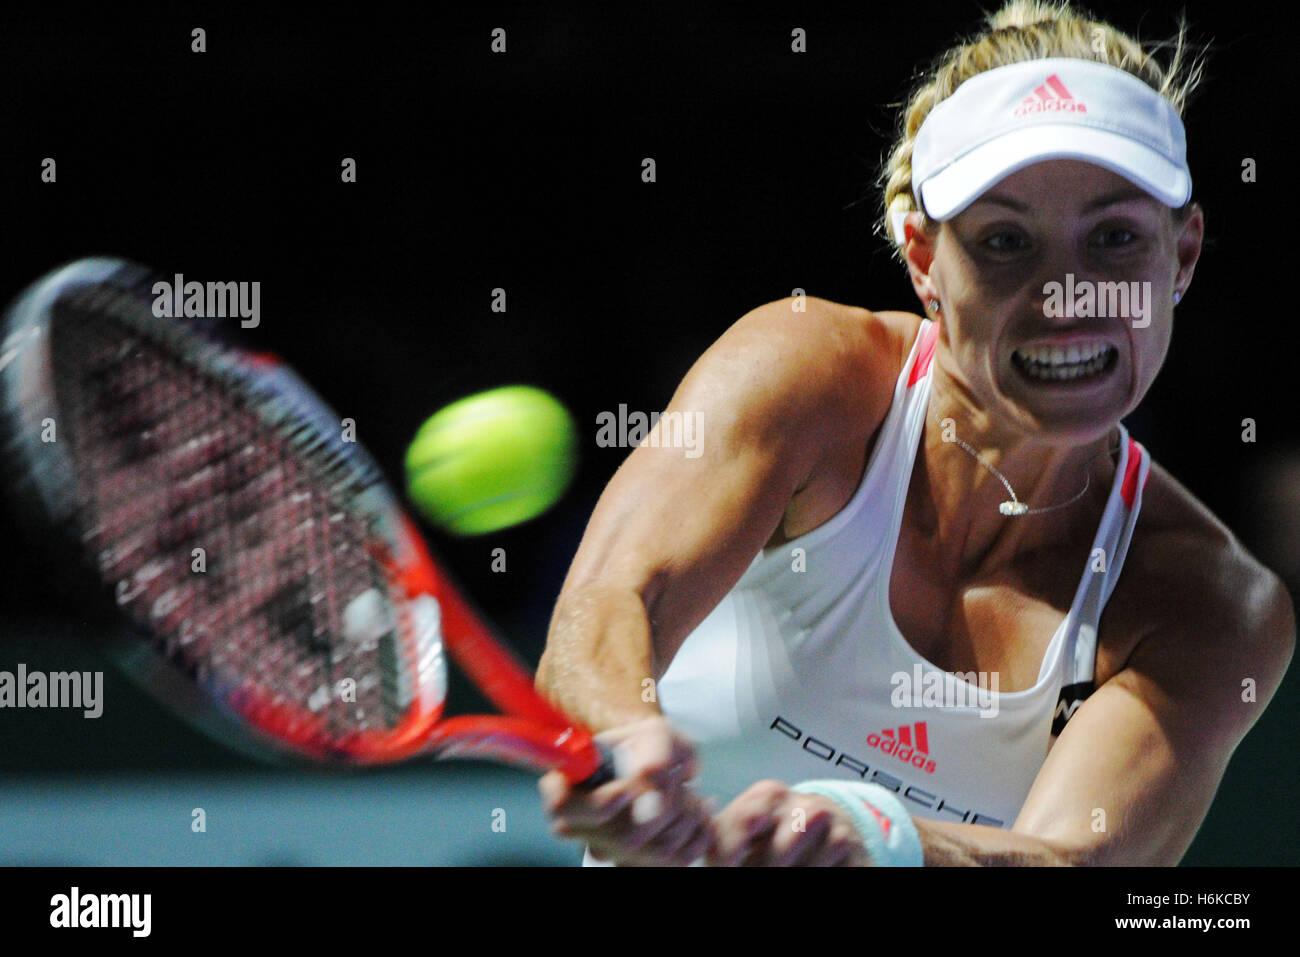 Singapur. 30 Oct, 2016. Angelique Kerber de Alemania compite durante la WTA Final partido contra Dominika Cibulkova Imagen De Stock